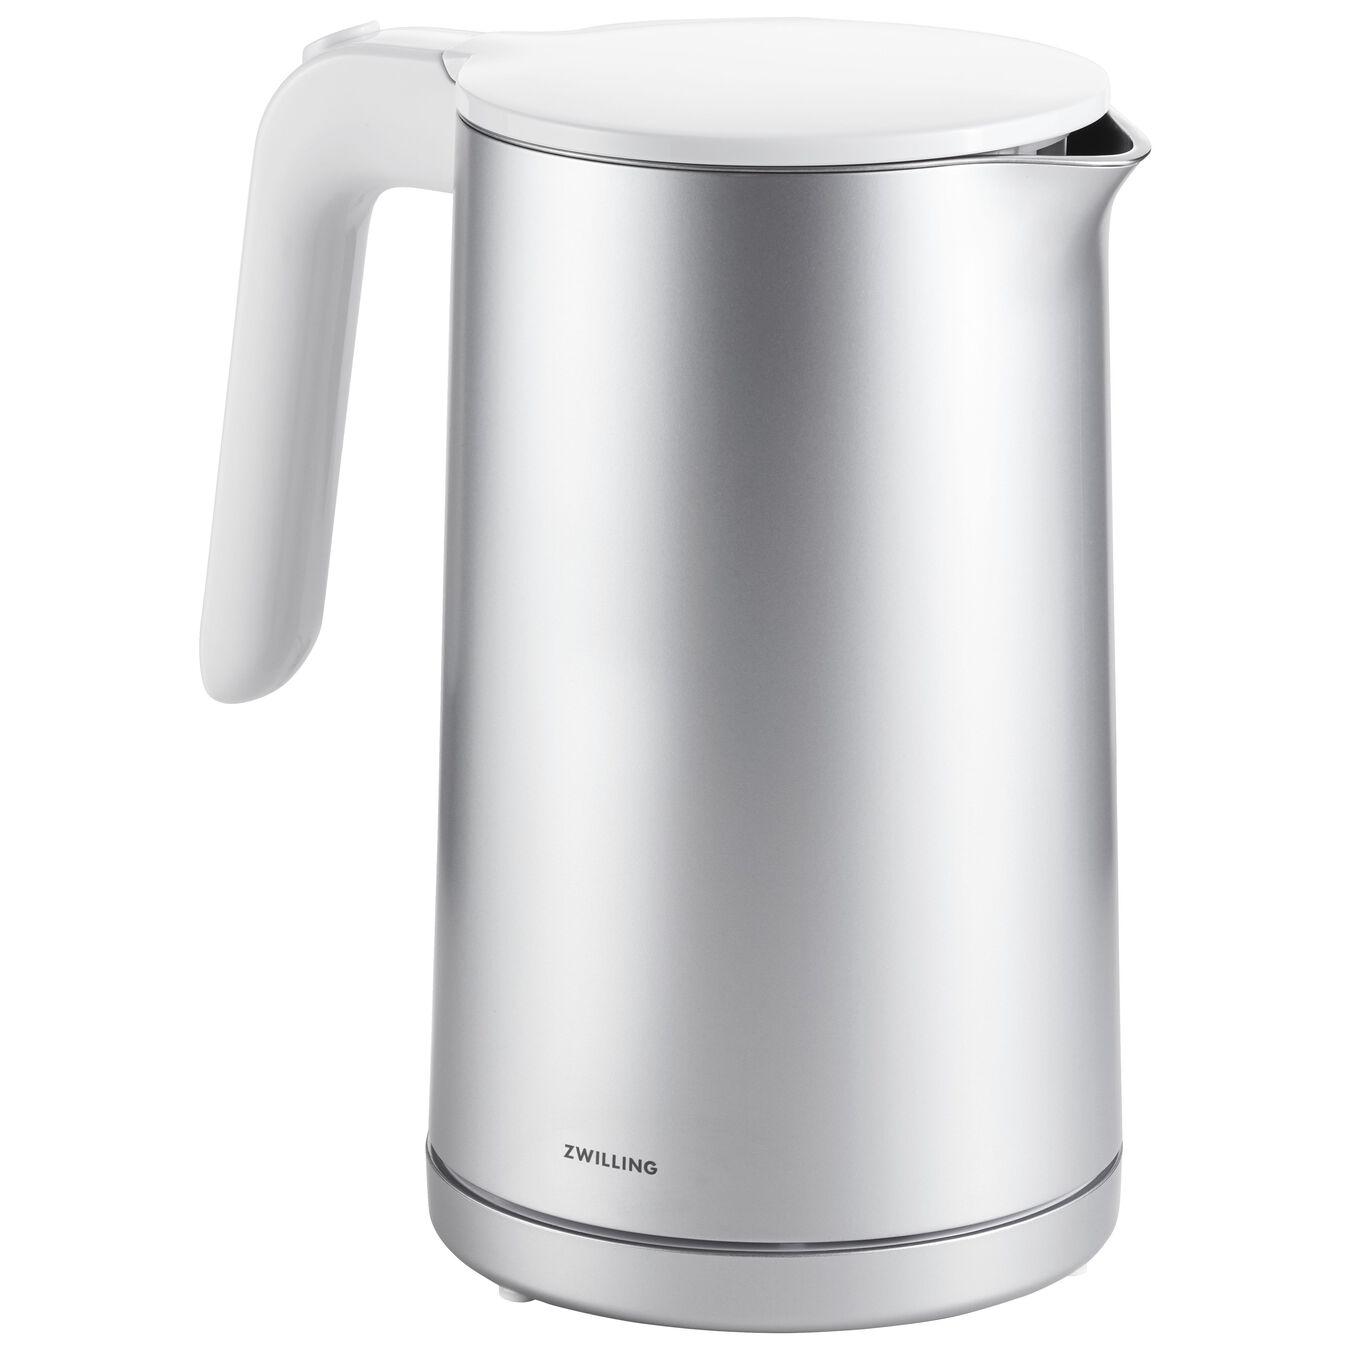 Wasserkocher, 1,5 l, Silber,,large 2